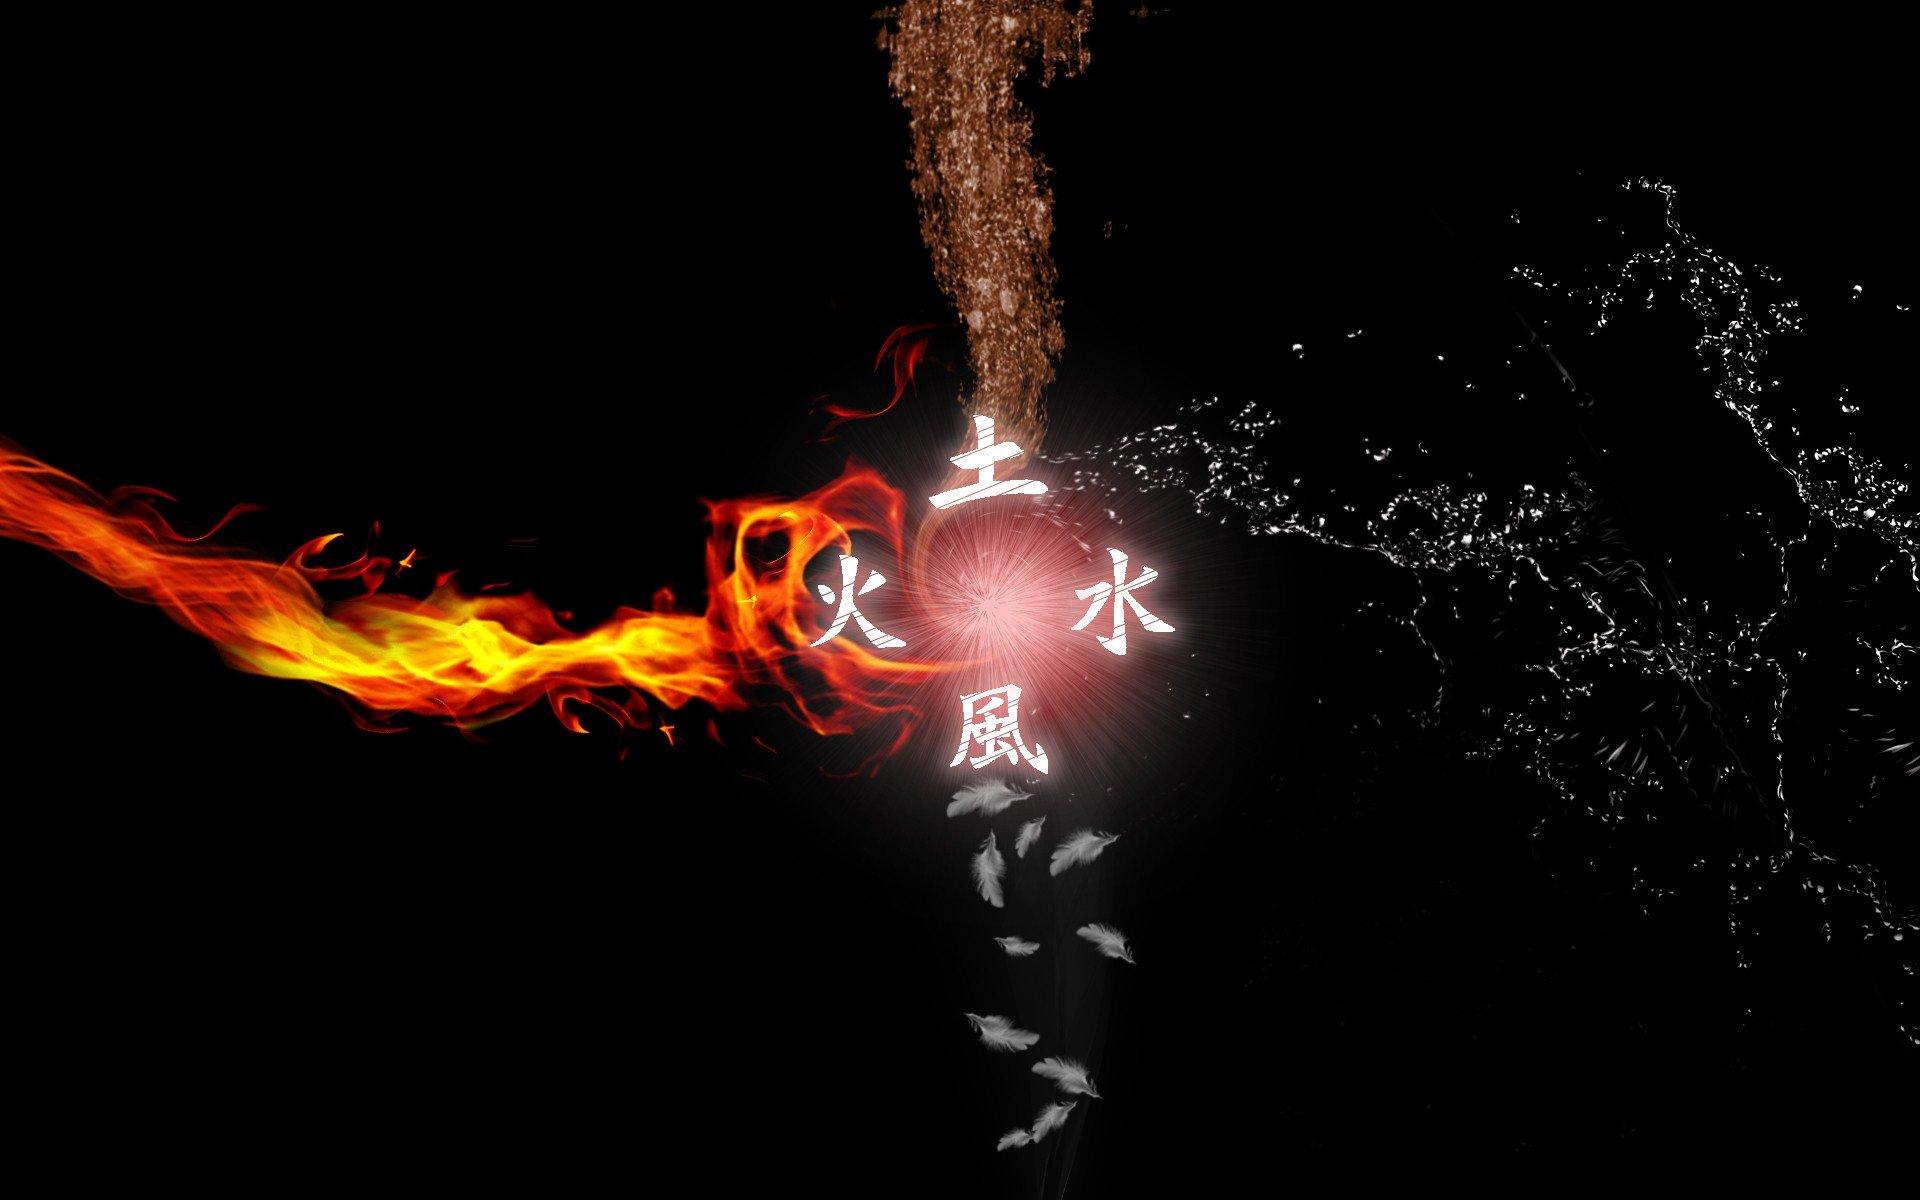 background Avatar The Legend of Korra fire fly wallpaper background 1920x1200